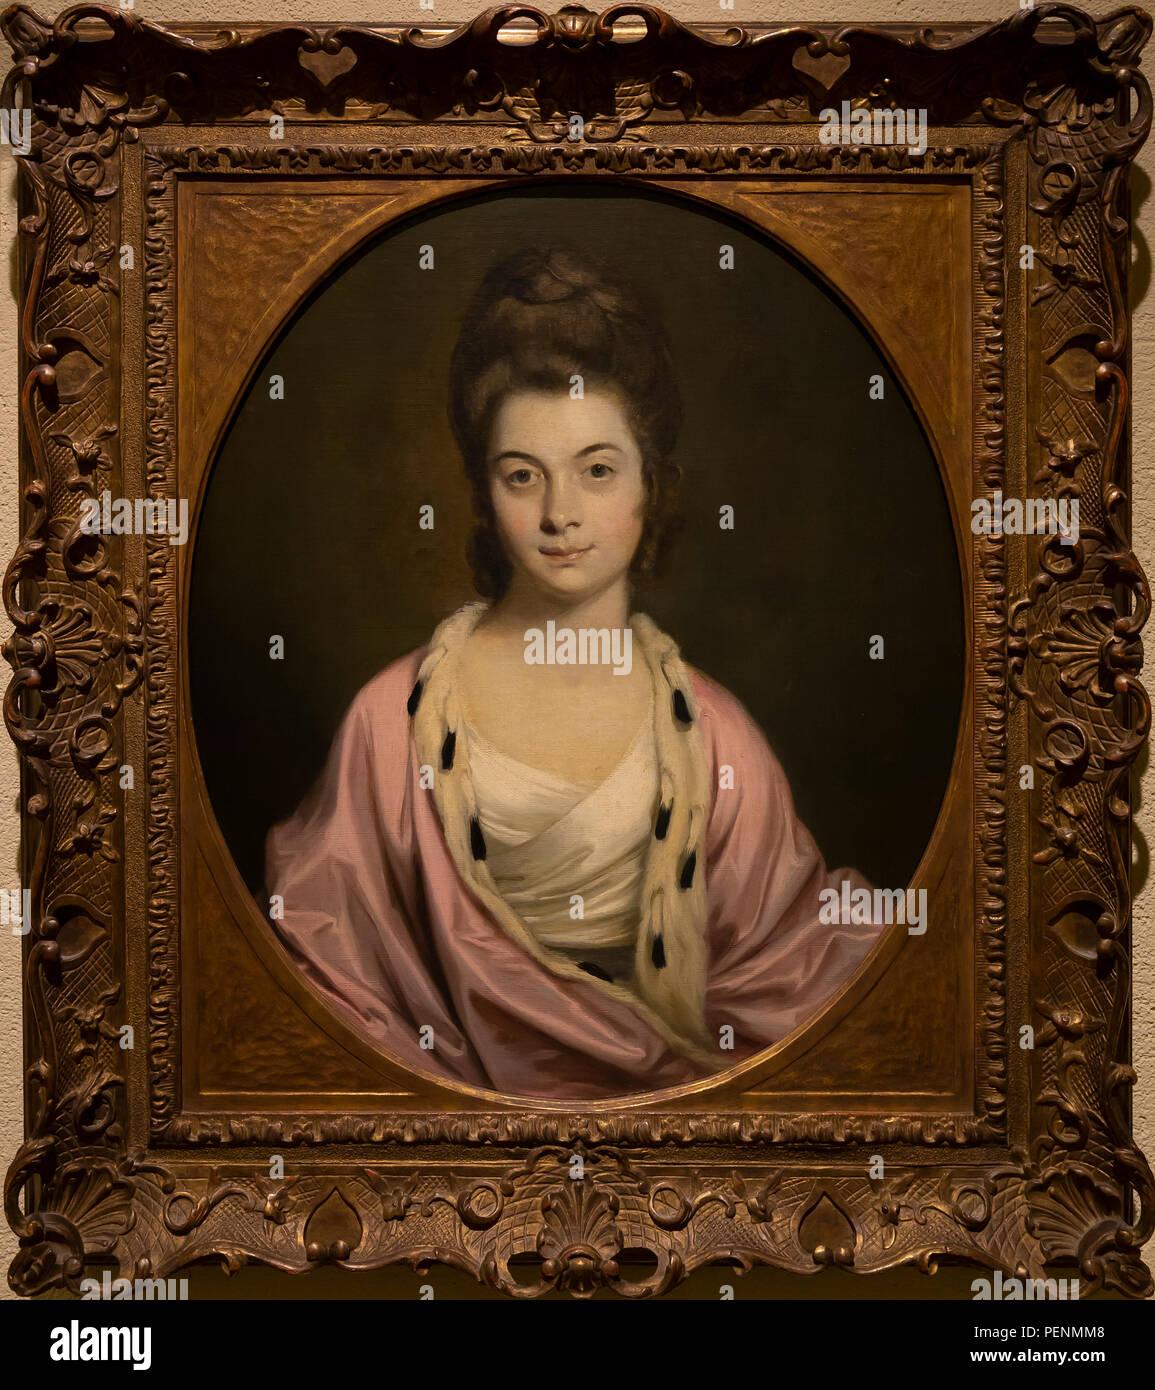 La sig.ra Thomas Watkinson Payler, Joshua Reynolds, 1771, Indianapolis Museum of Art, Indianapolis, Indiana, Stati Uniti d'America, America del Nord Immagini Stock